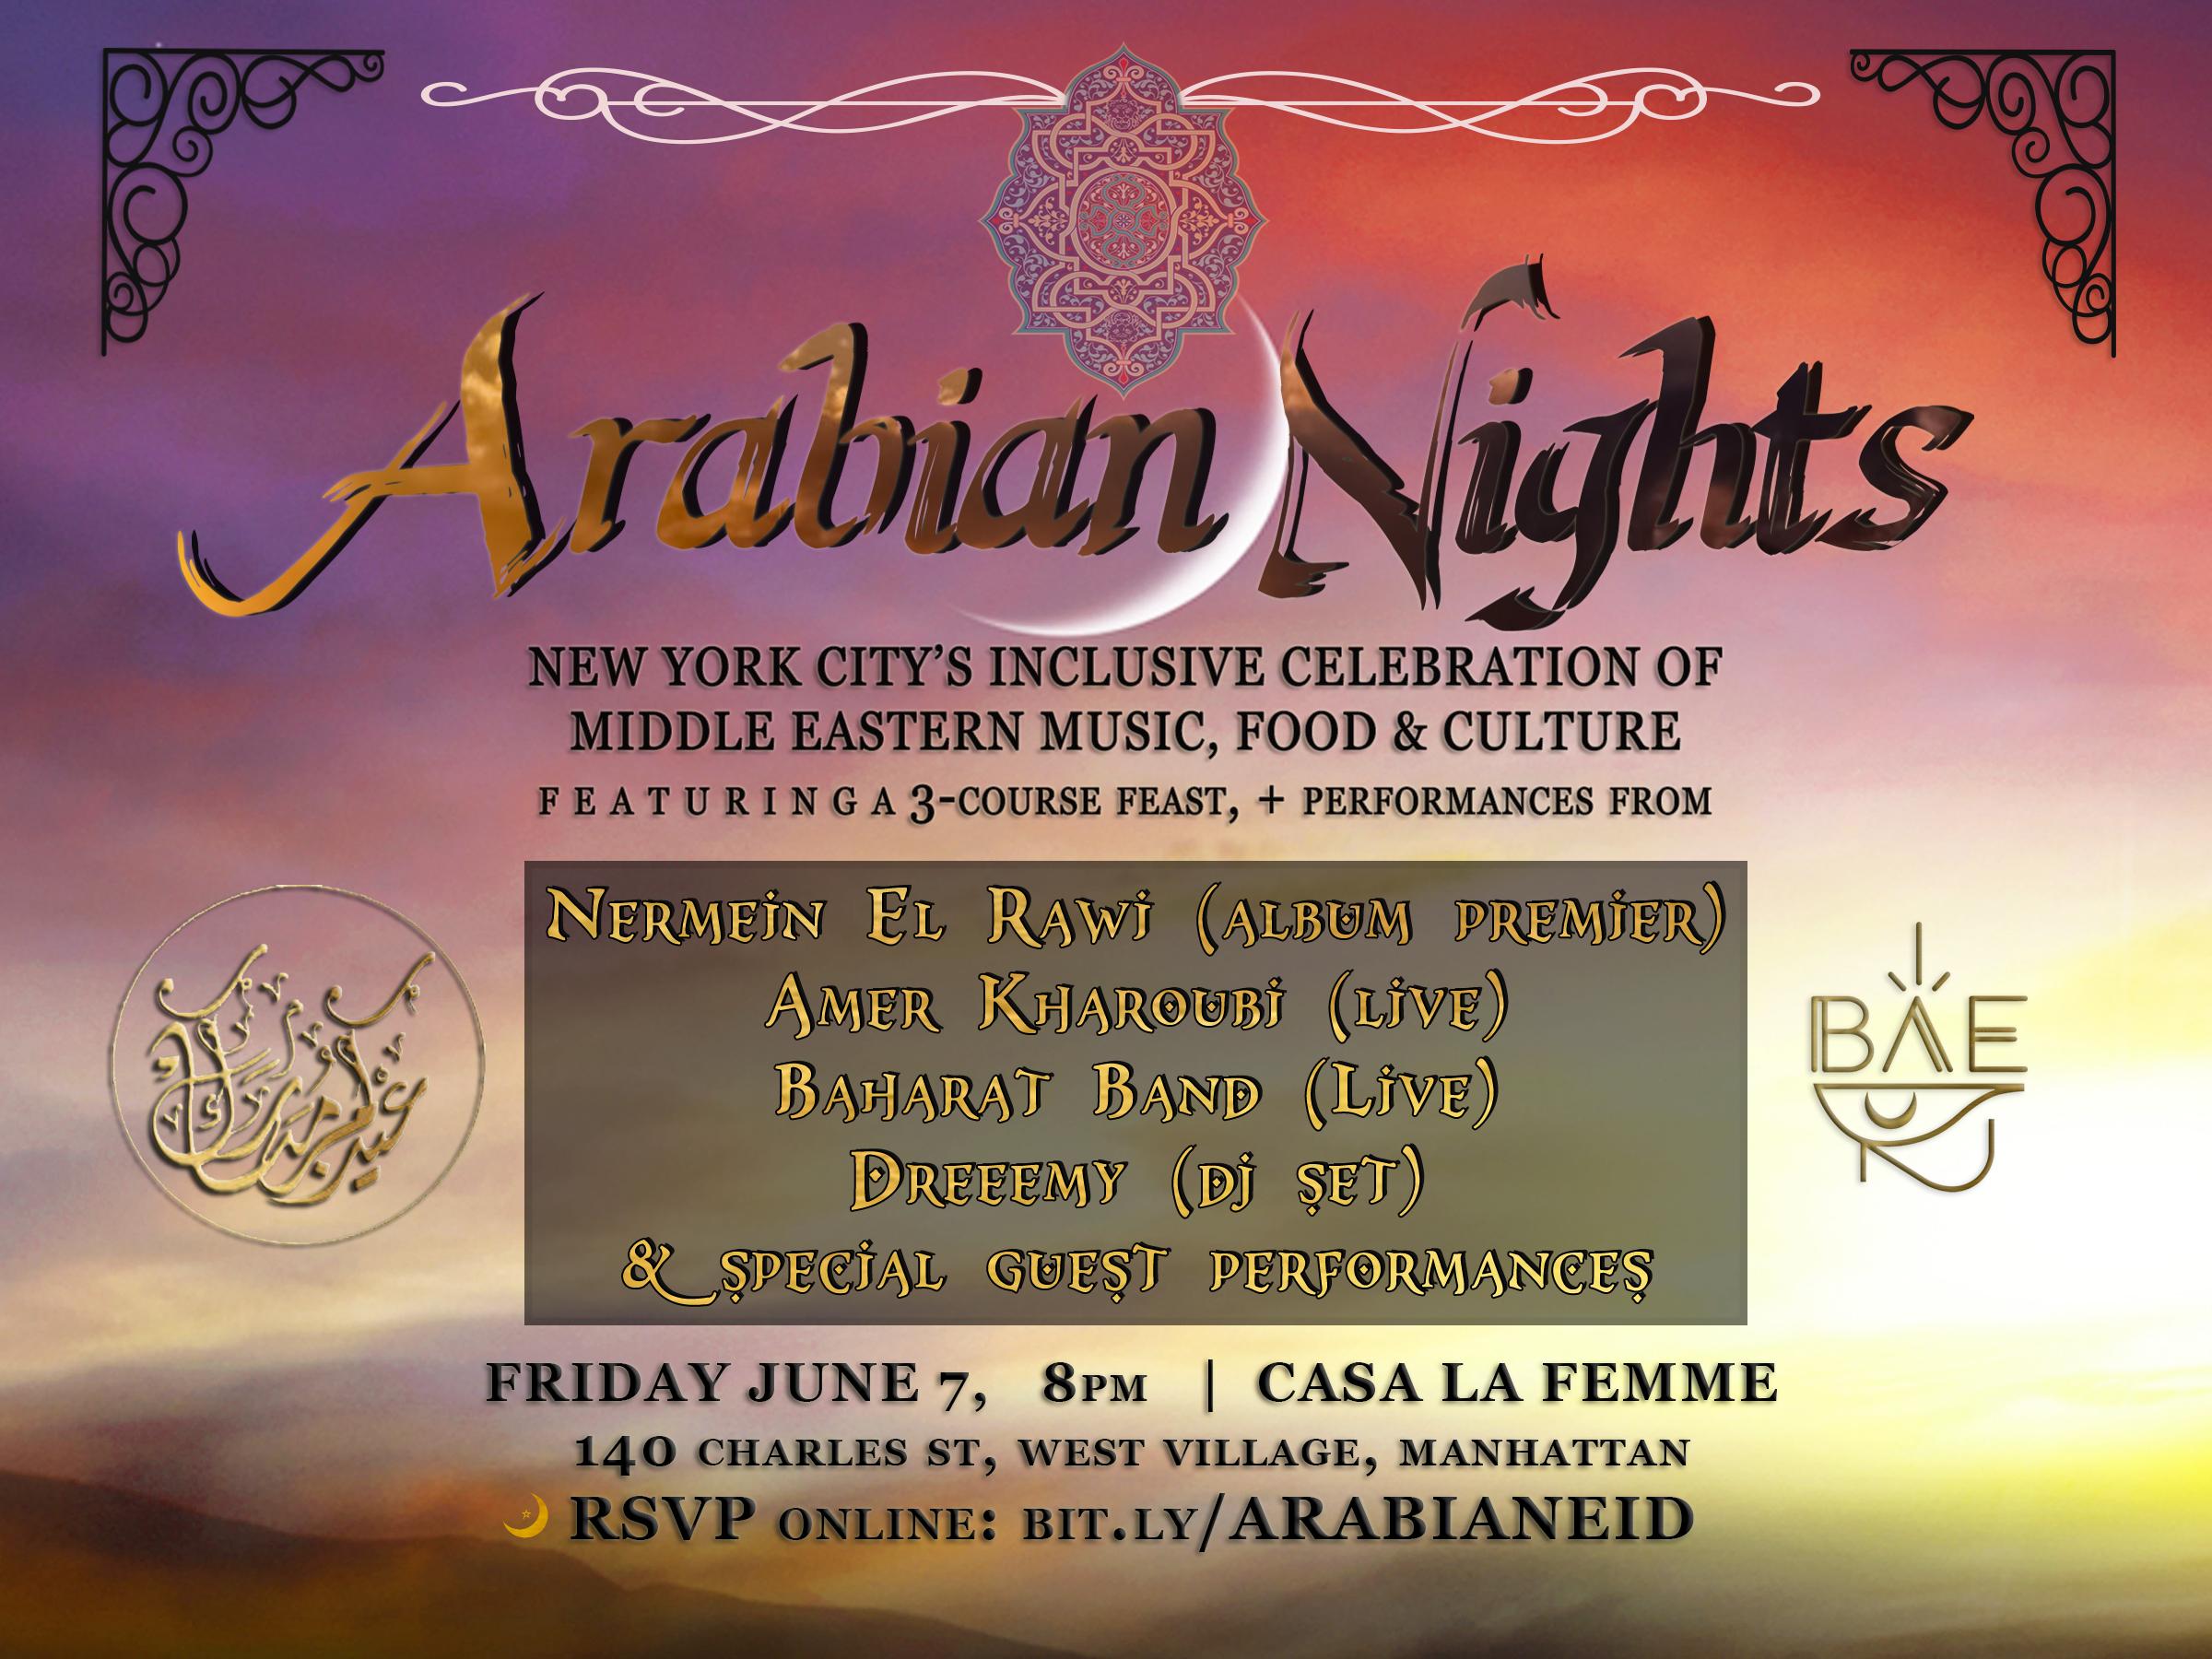 ARABIAN NIGHTS FLYER_FINALxx.png